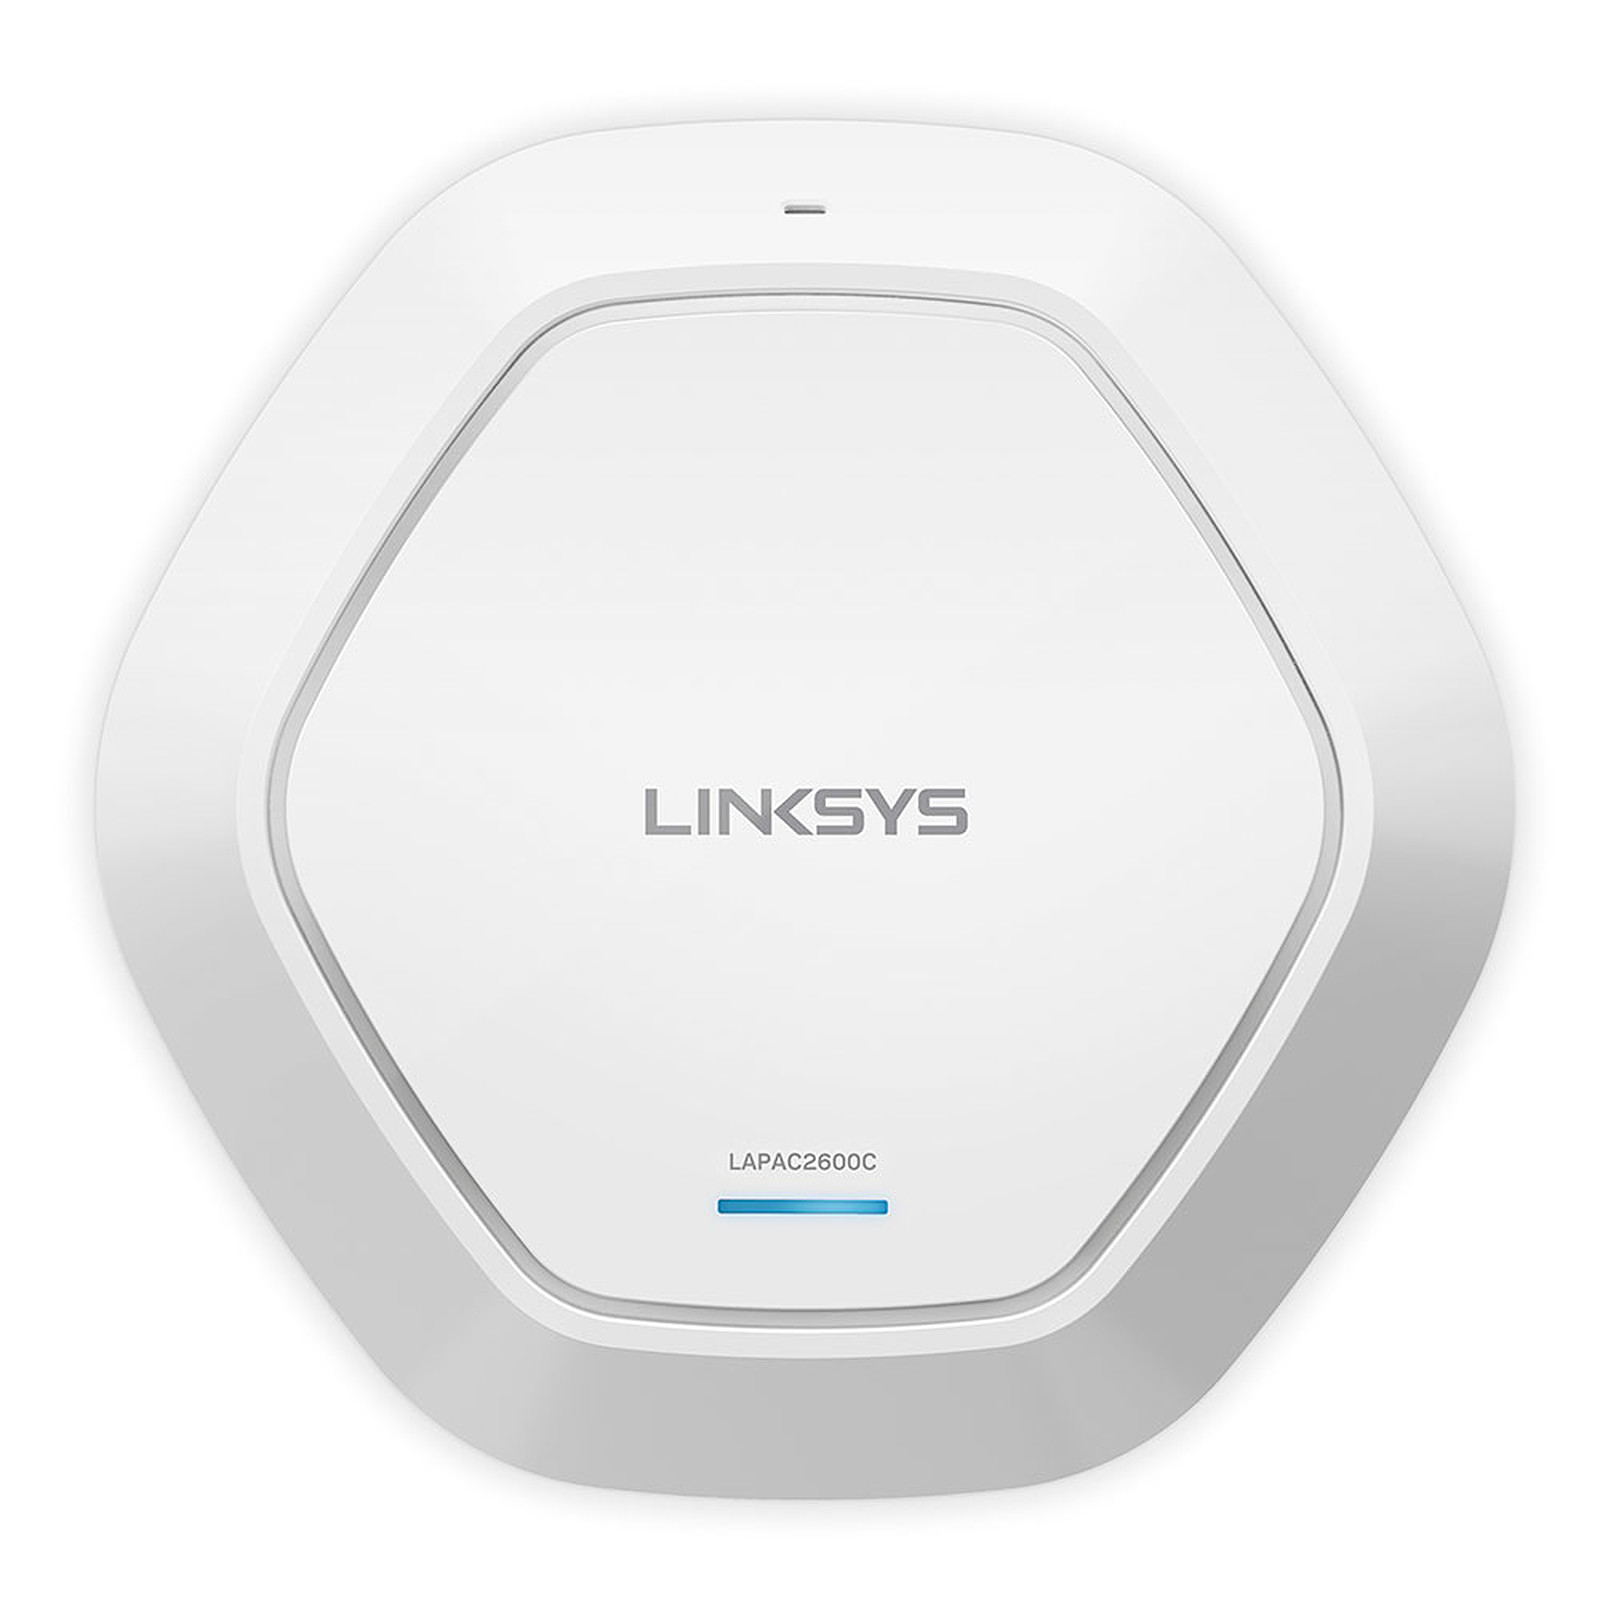 Linksys LAPAC2600C